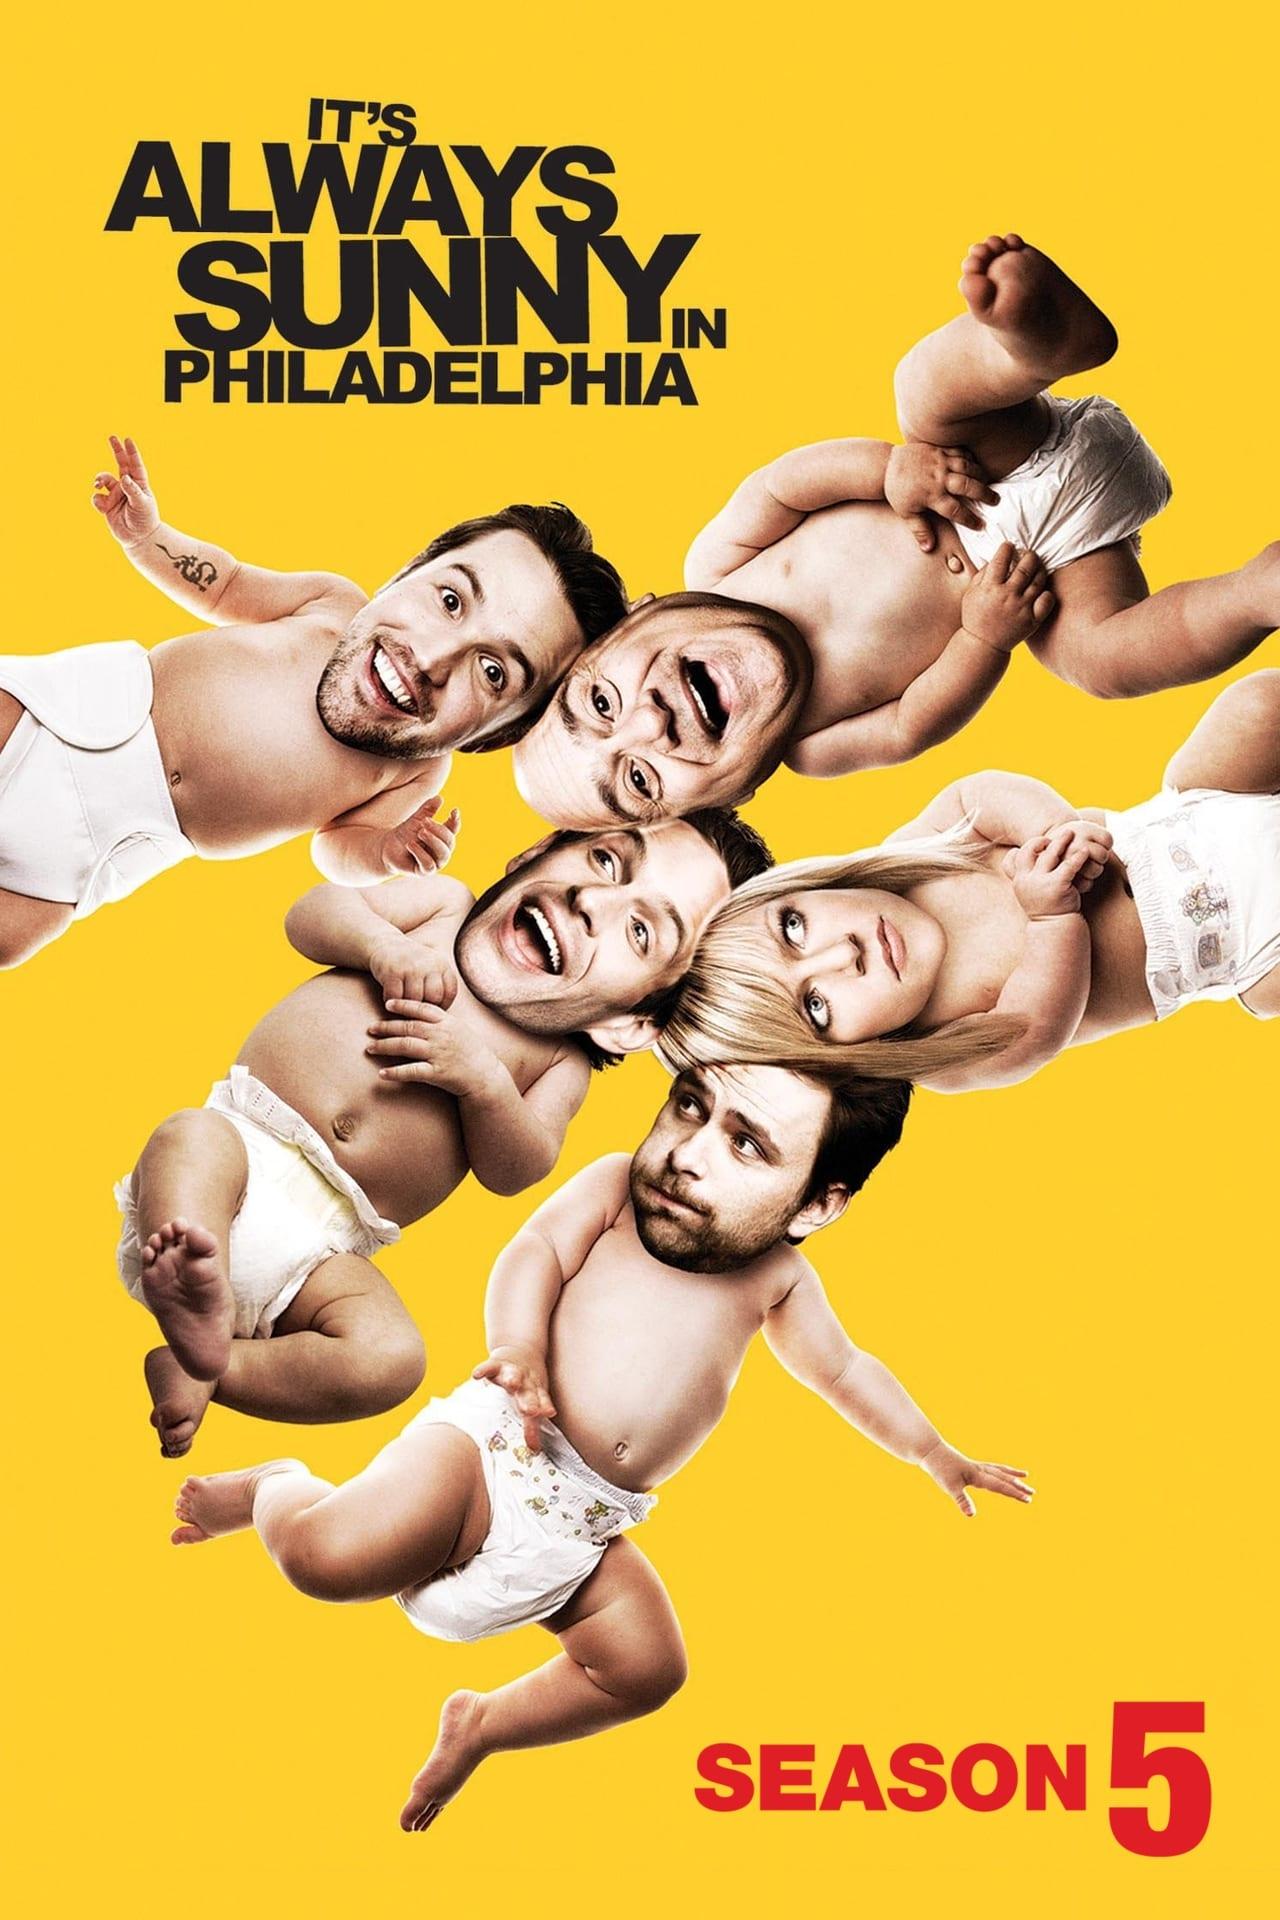 Putlocker It's Always Sunny In Philadelphia Season 5 (2009)